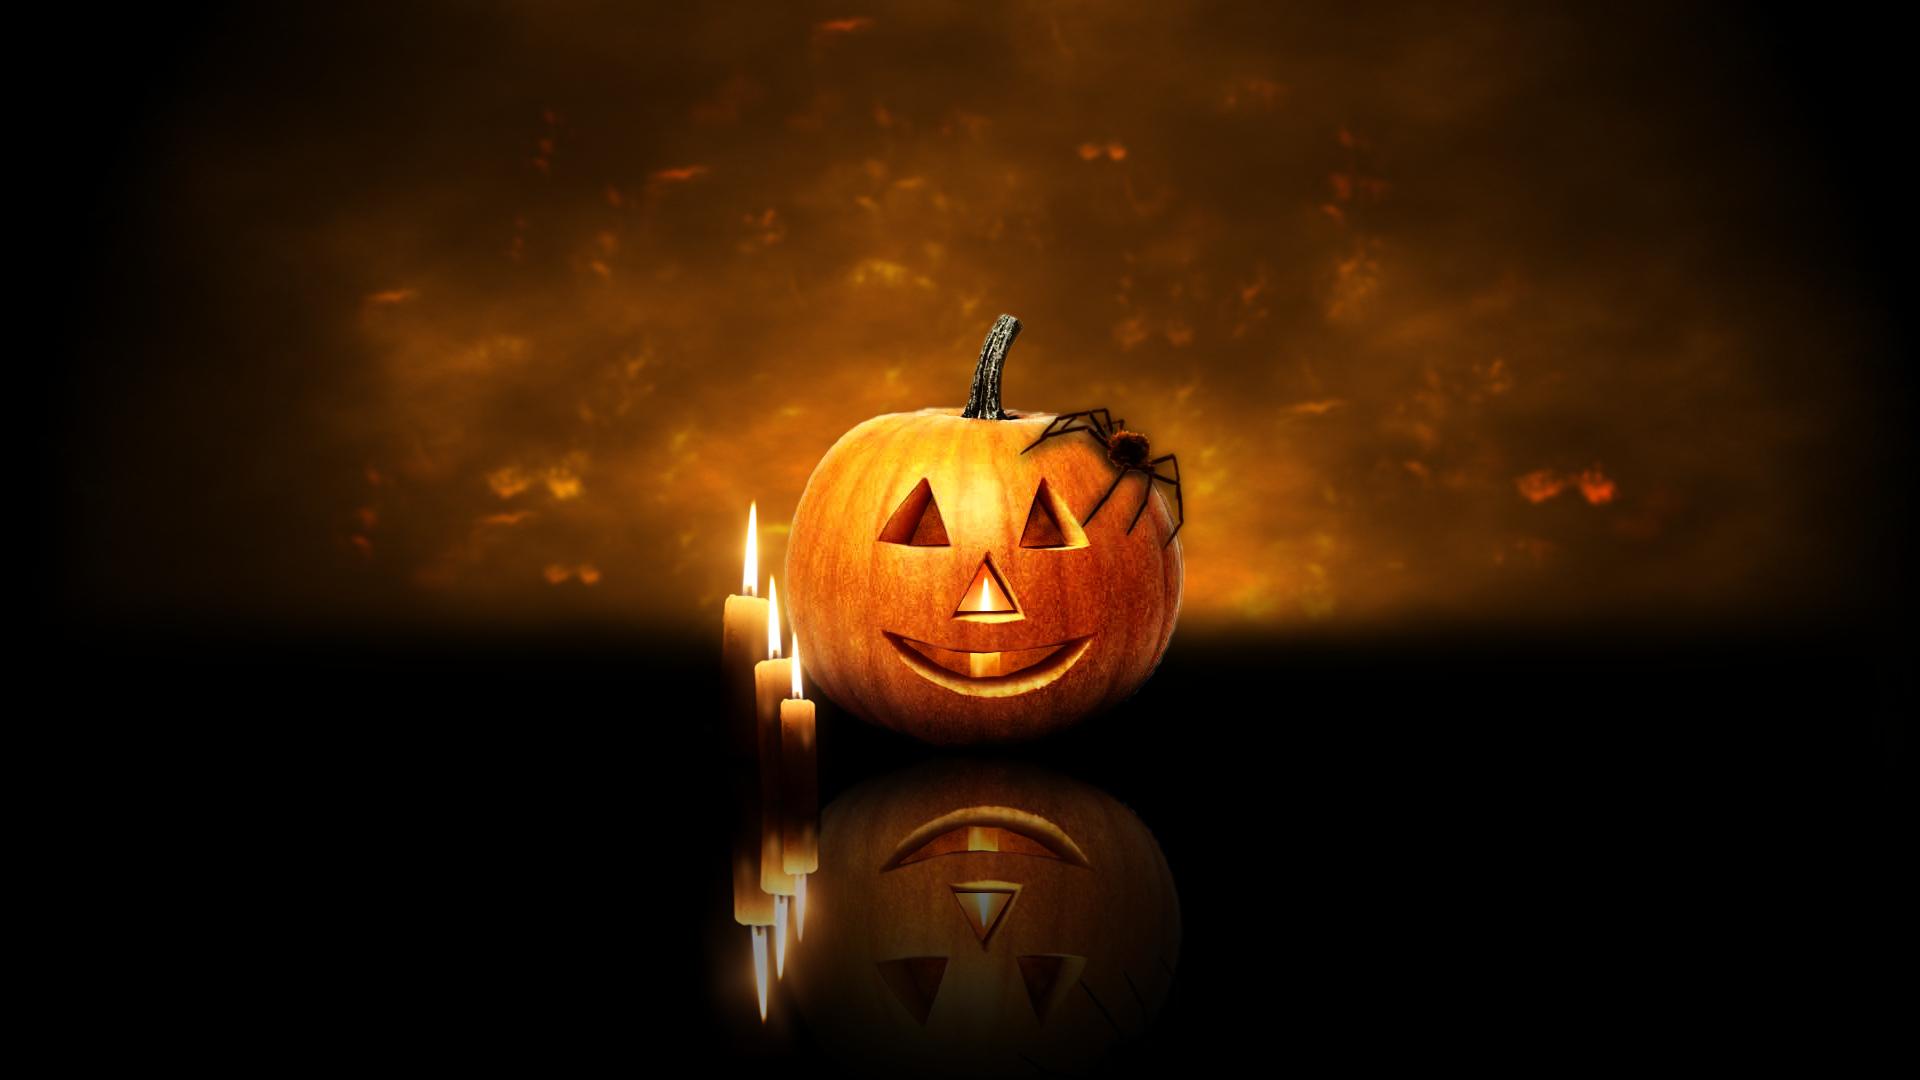 Halloween Wallpaper Background in HD 1920x1080